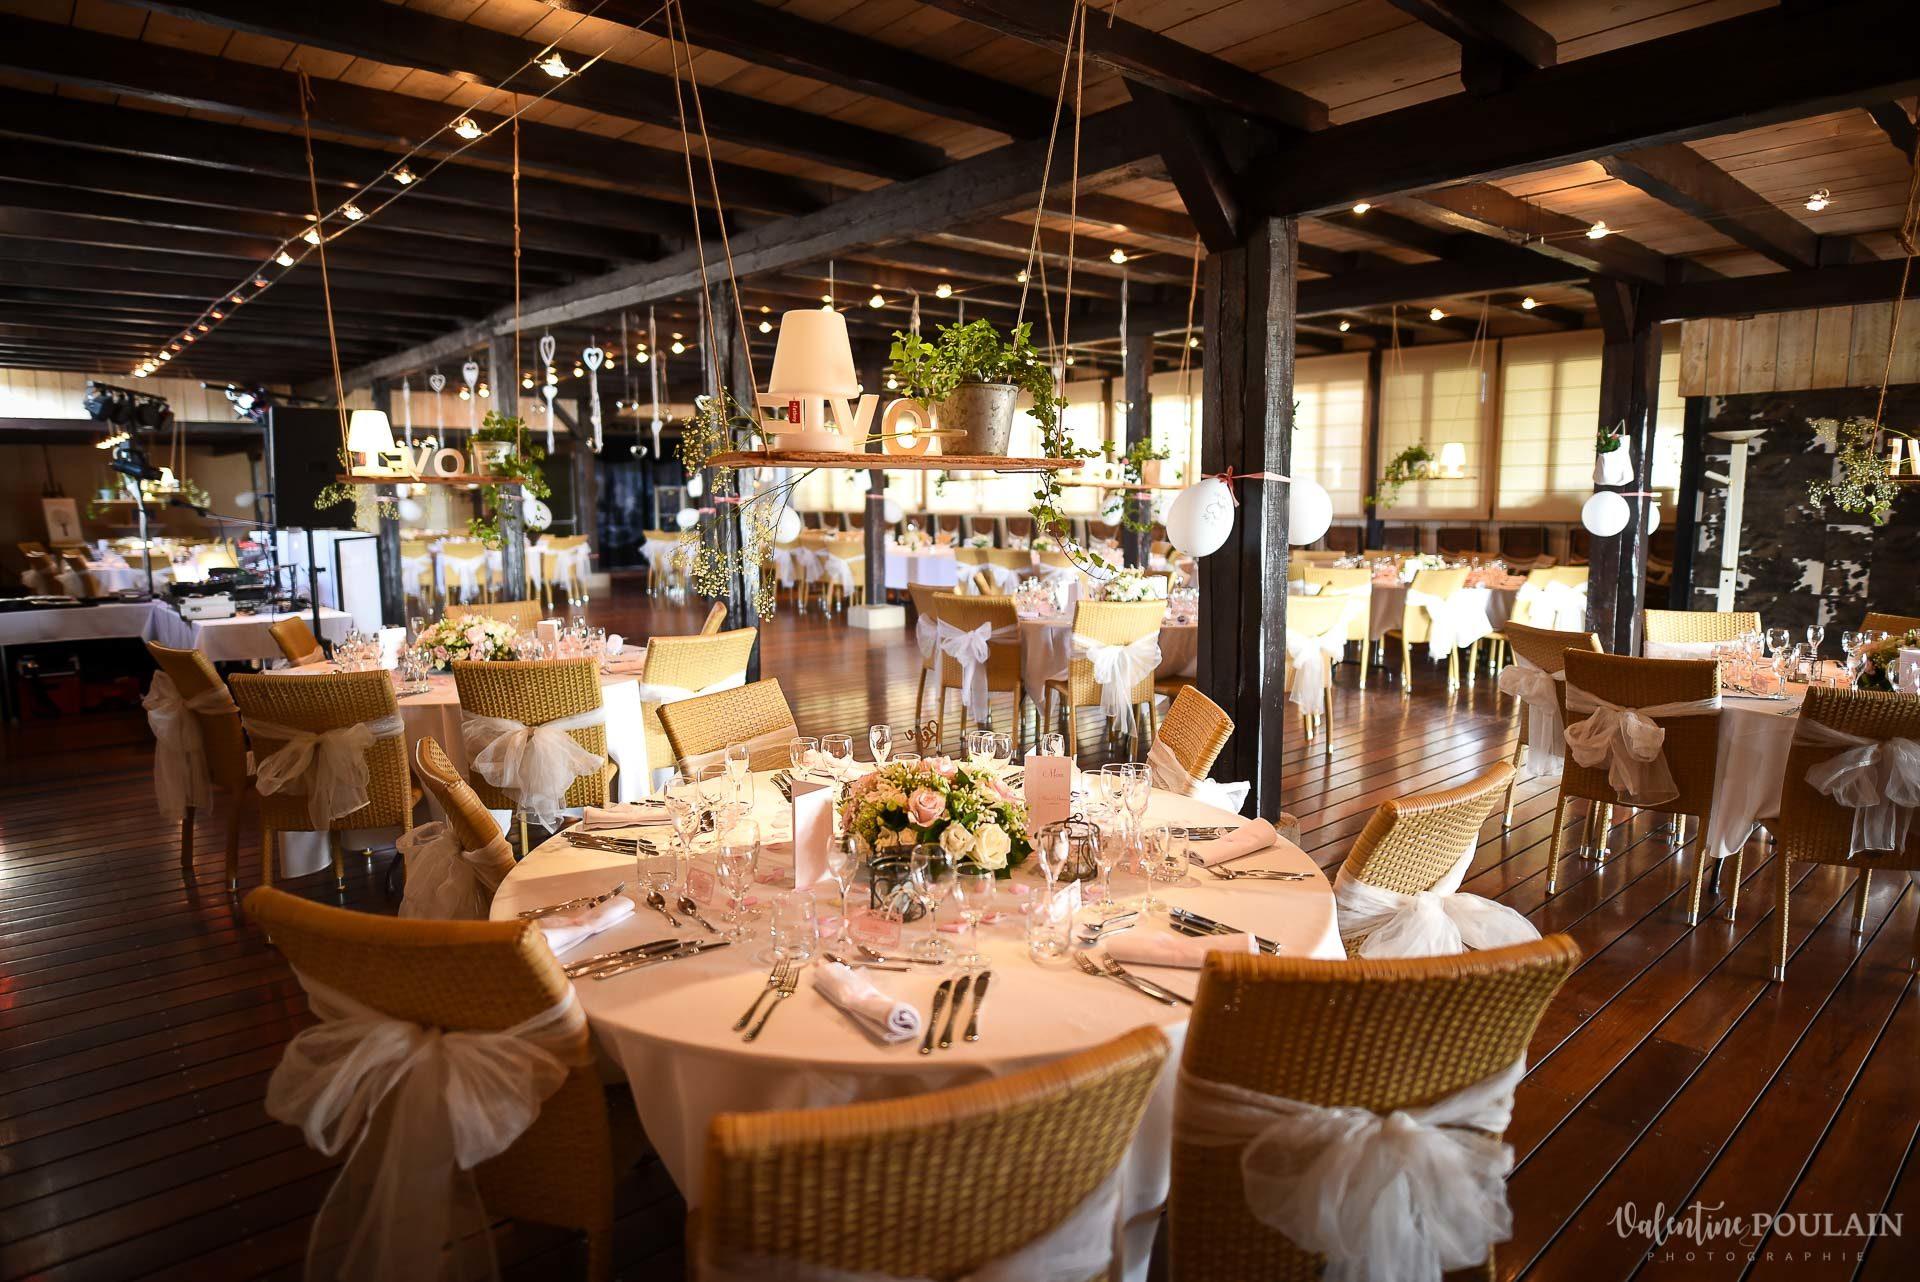 Mariage cool ferme weyerbach - Valentine Poulain table lieu